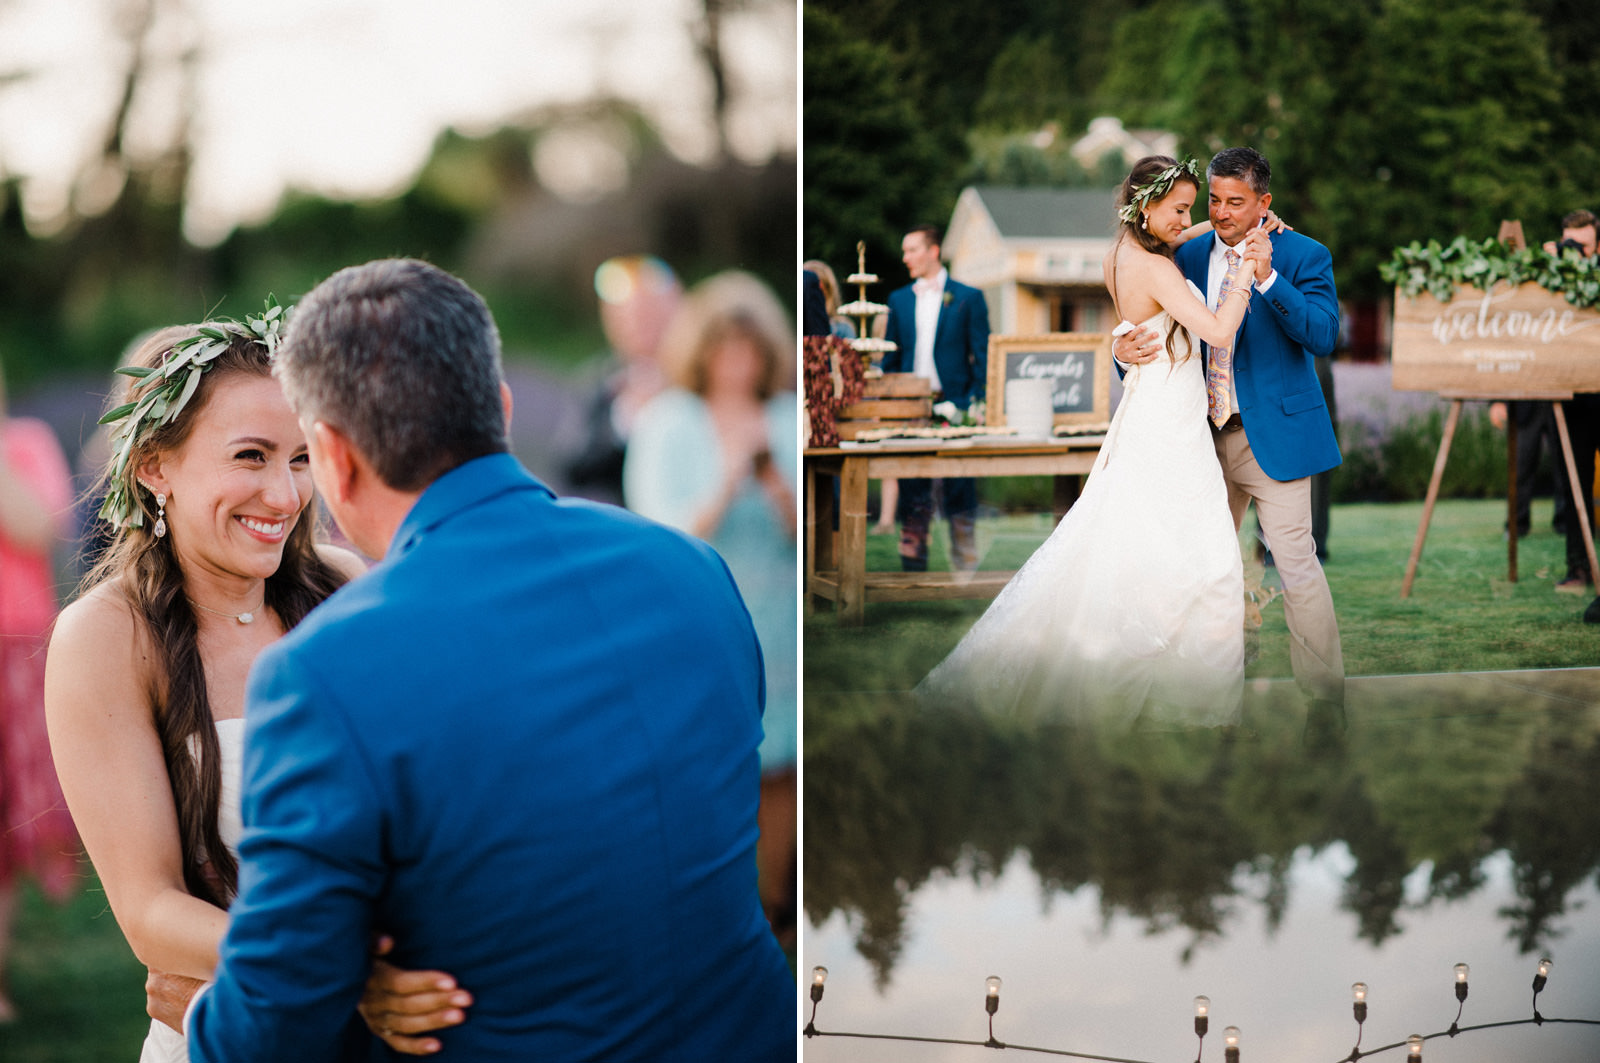 086-woodinville-lavendar-farm-wedding-with-golden-glowy-photos.jpg